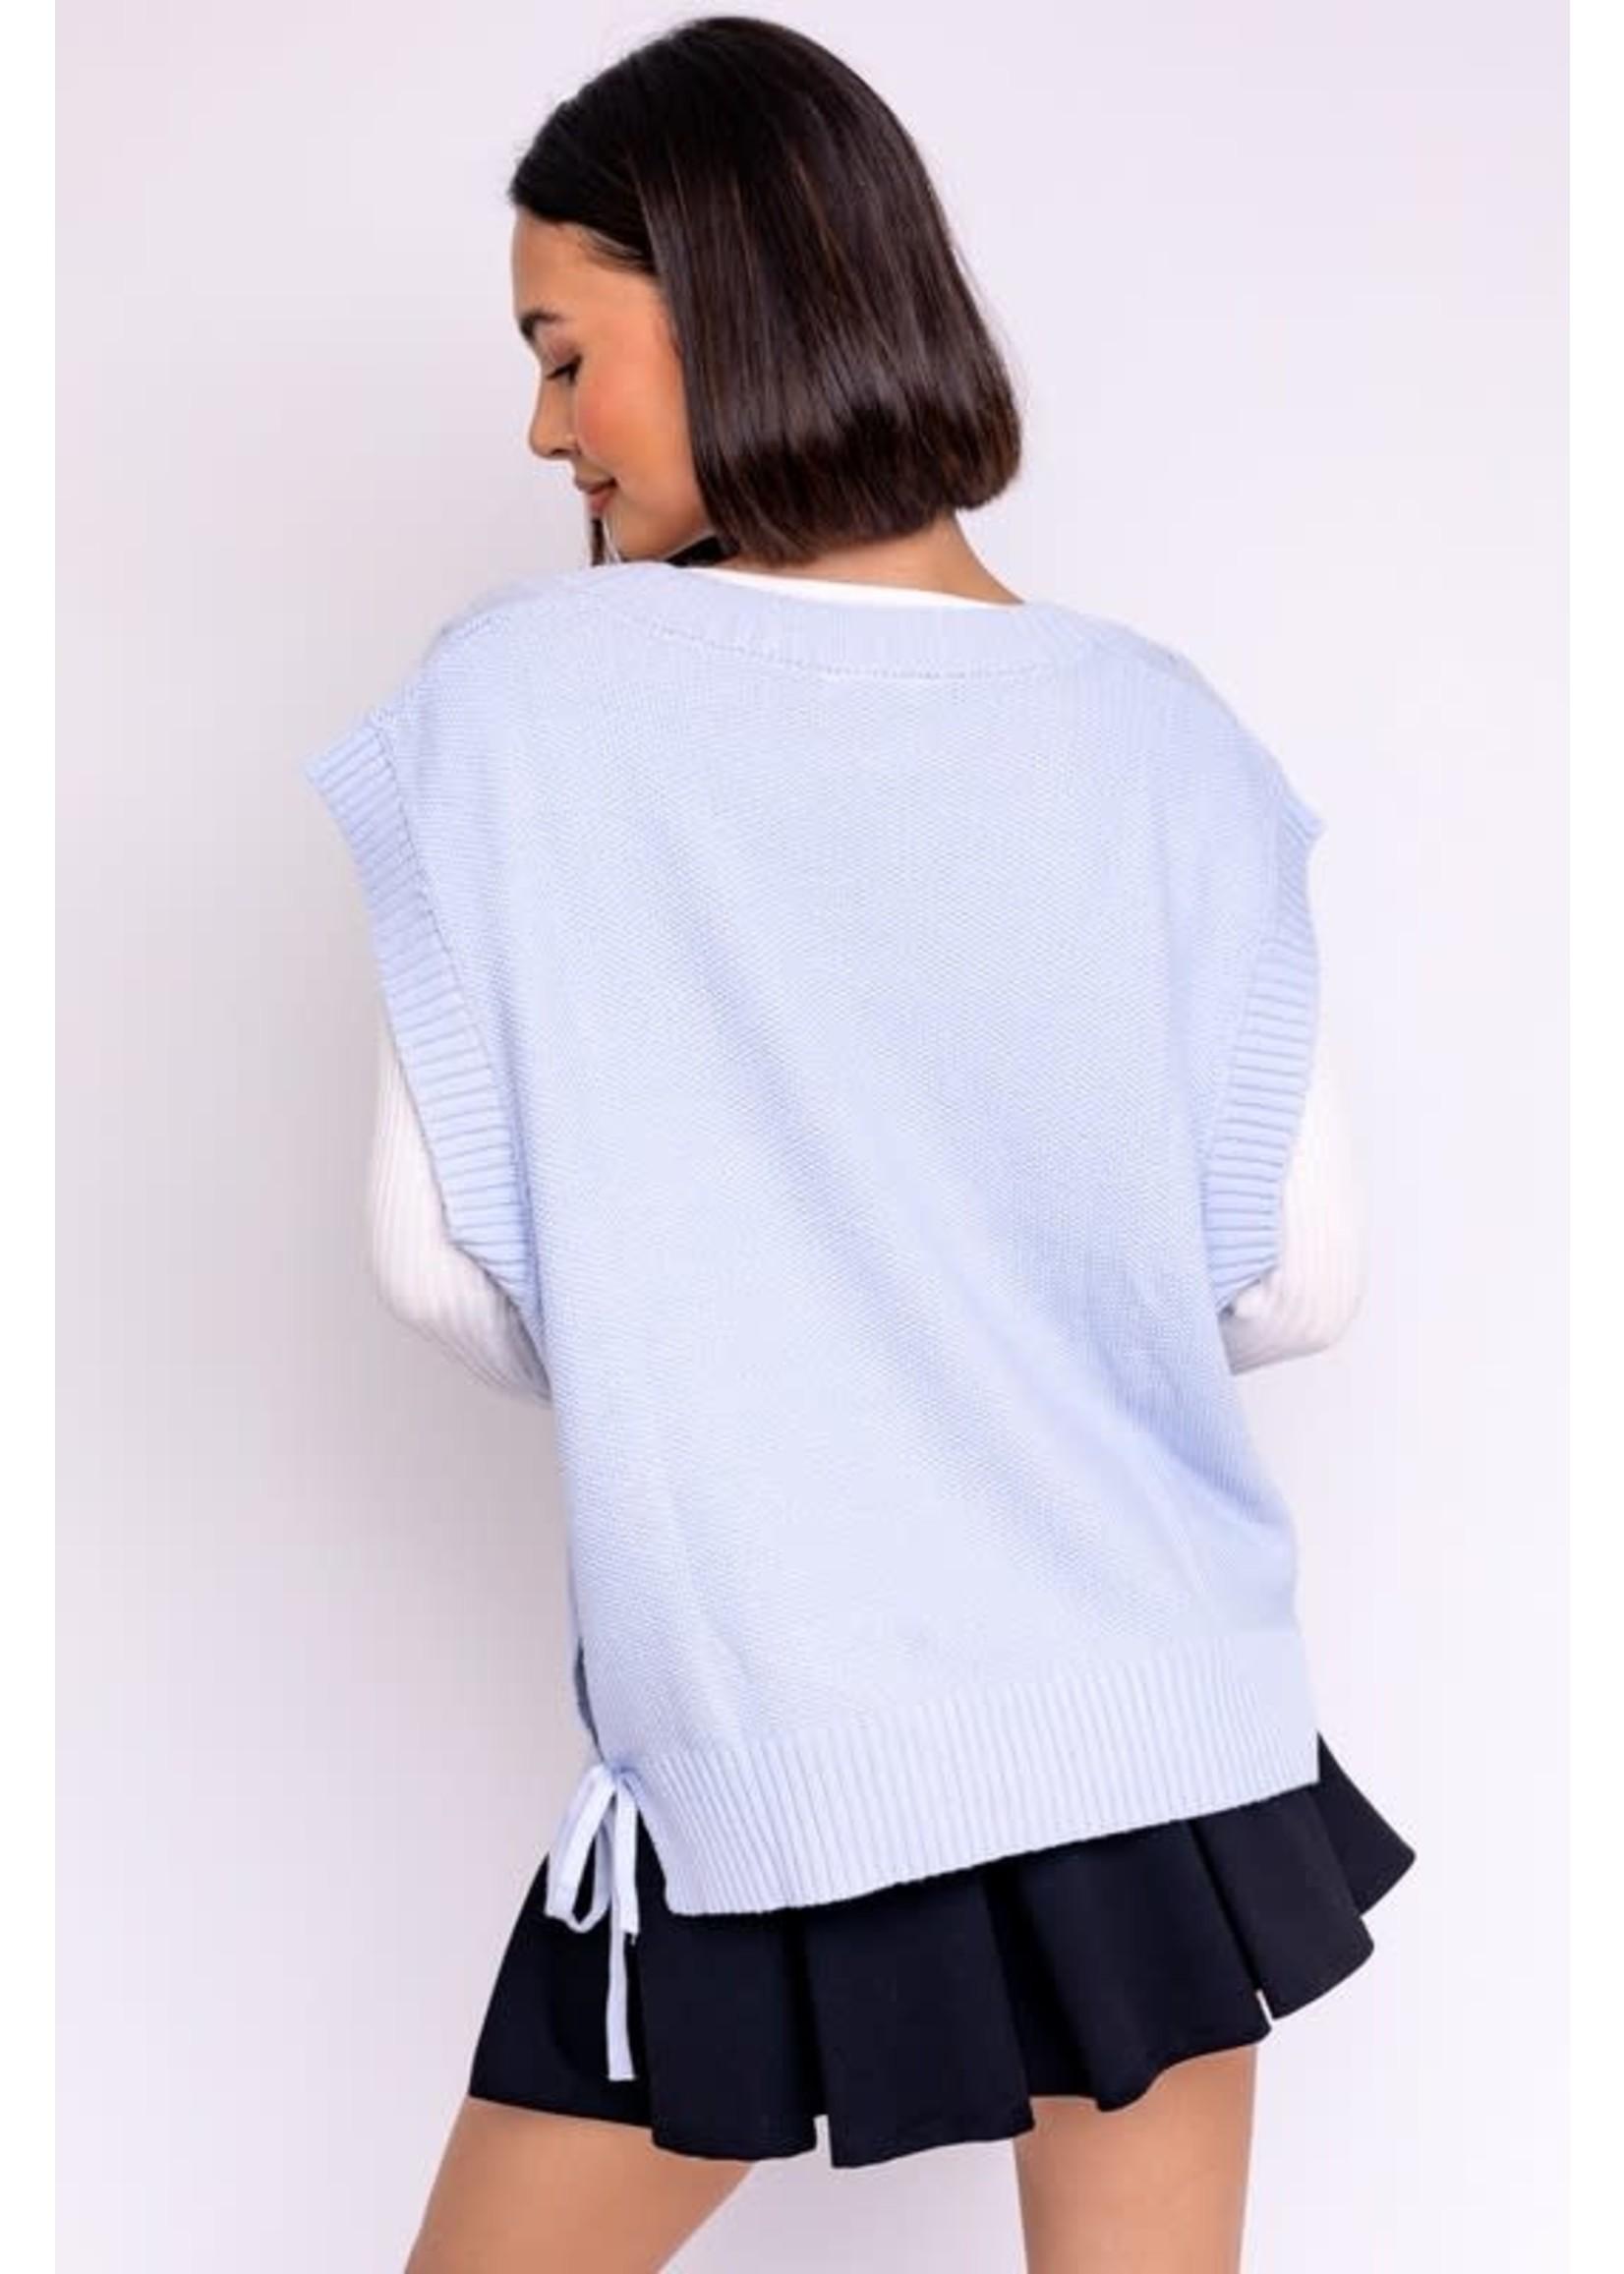 Le Lis Cable Vest Sweater Top - SWT6686